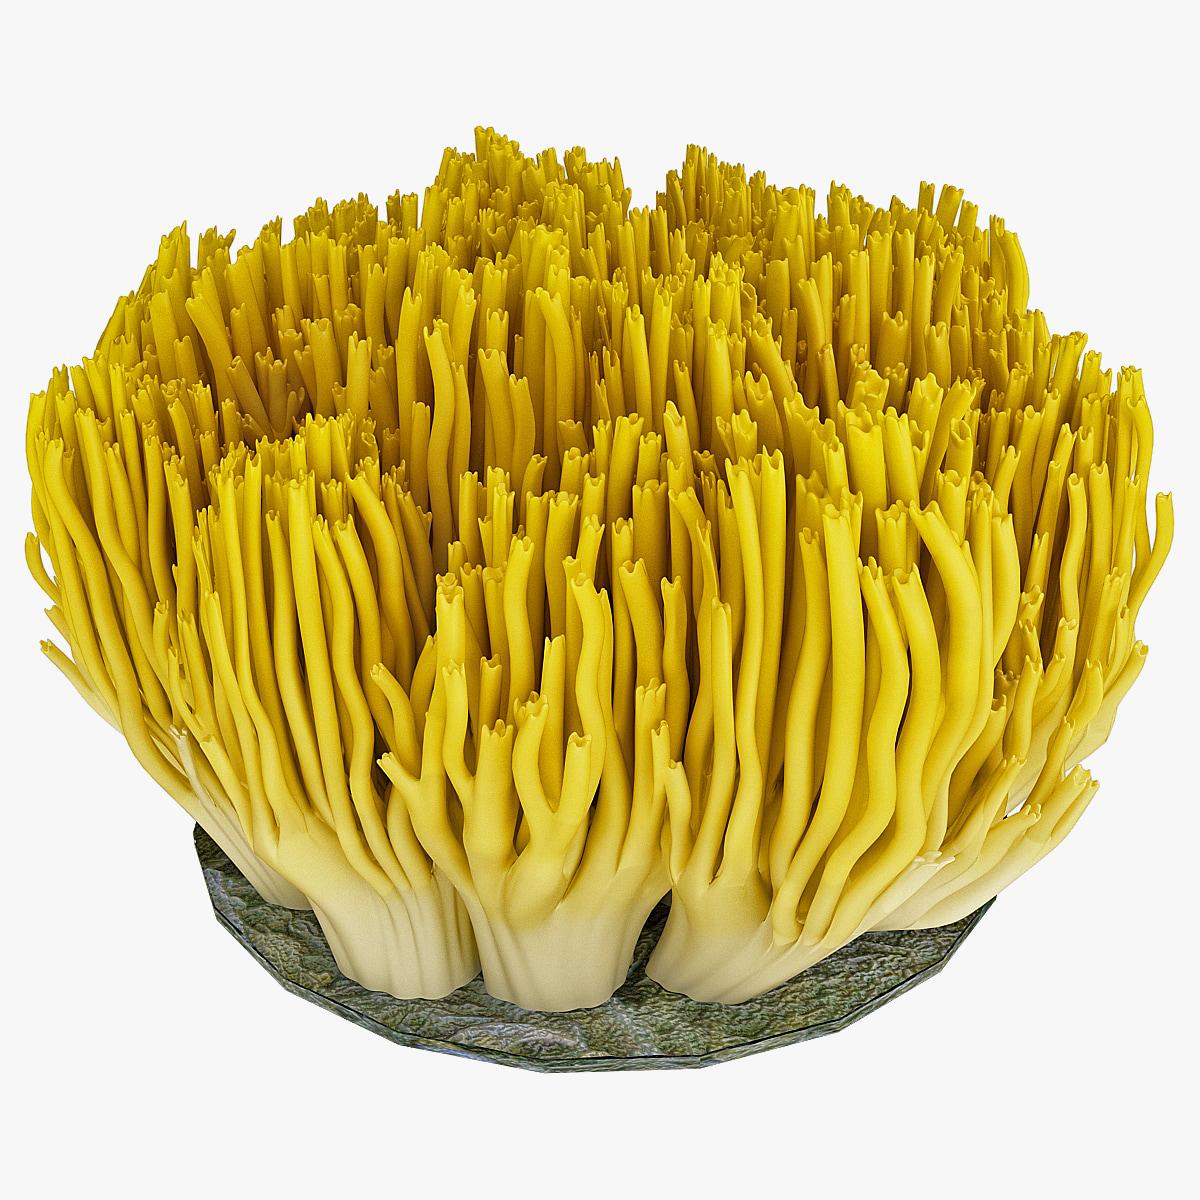 130662_Coral_Fungus_000.jpg